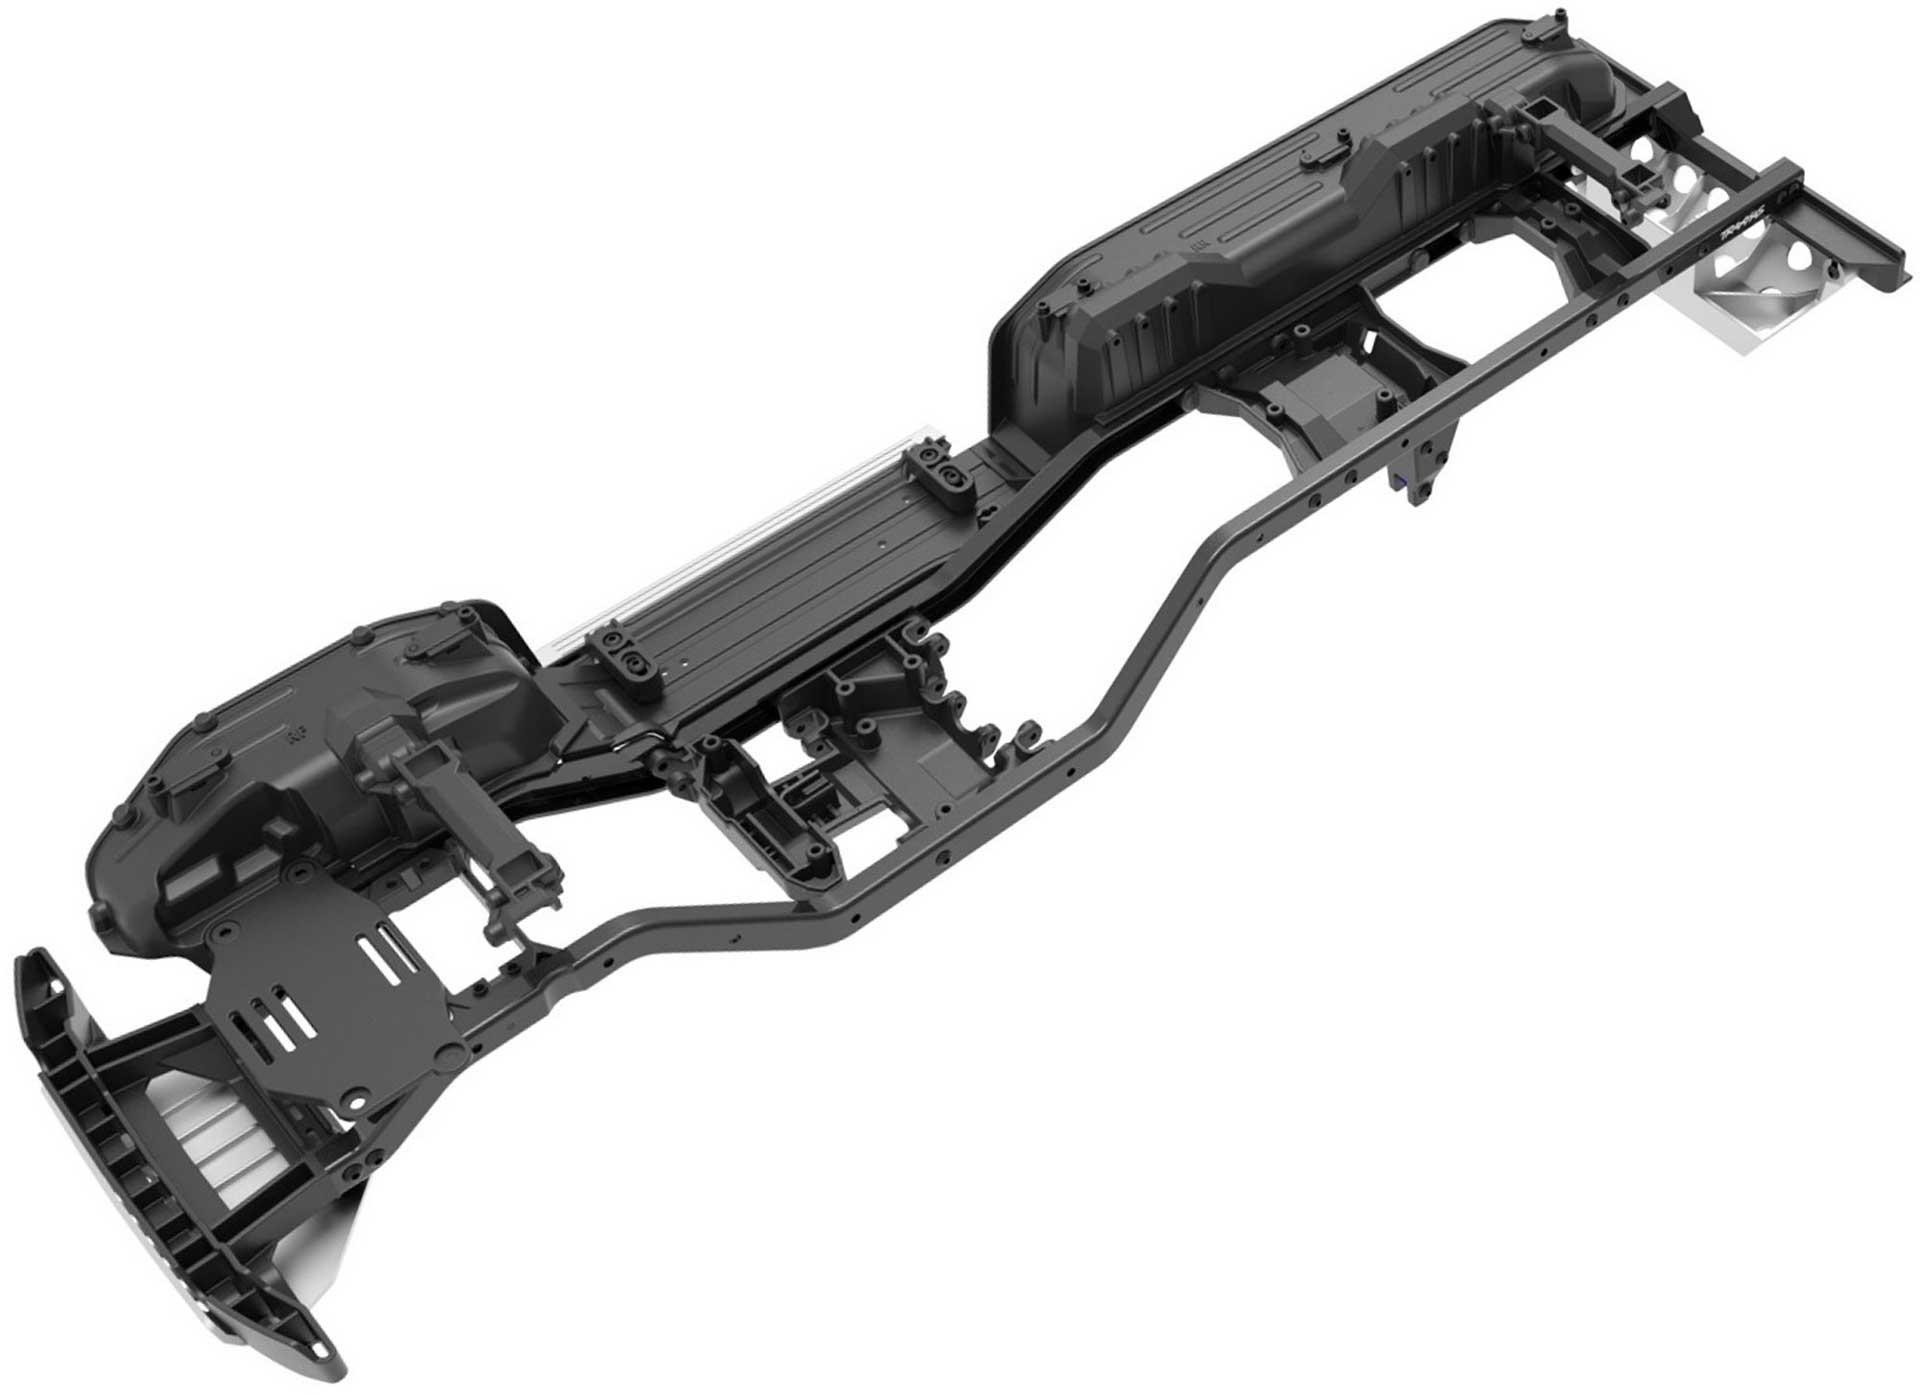 TRAXXAS TRX-6 MERCEDES-BENZ G 63 AMG 6X6 CRAWLER BRUSHED SCHWARZ RTR